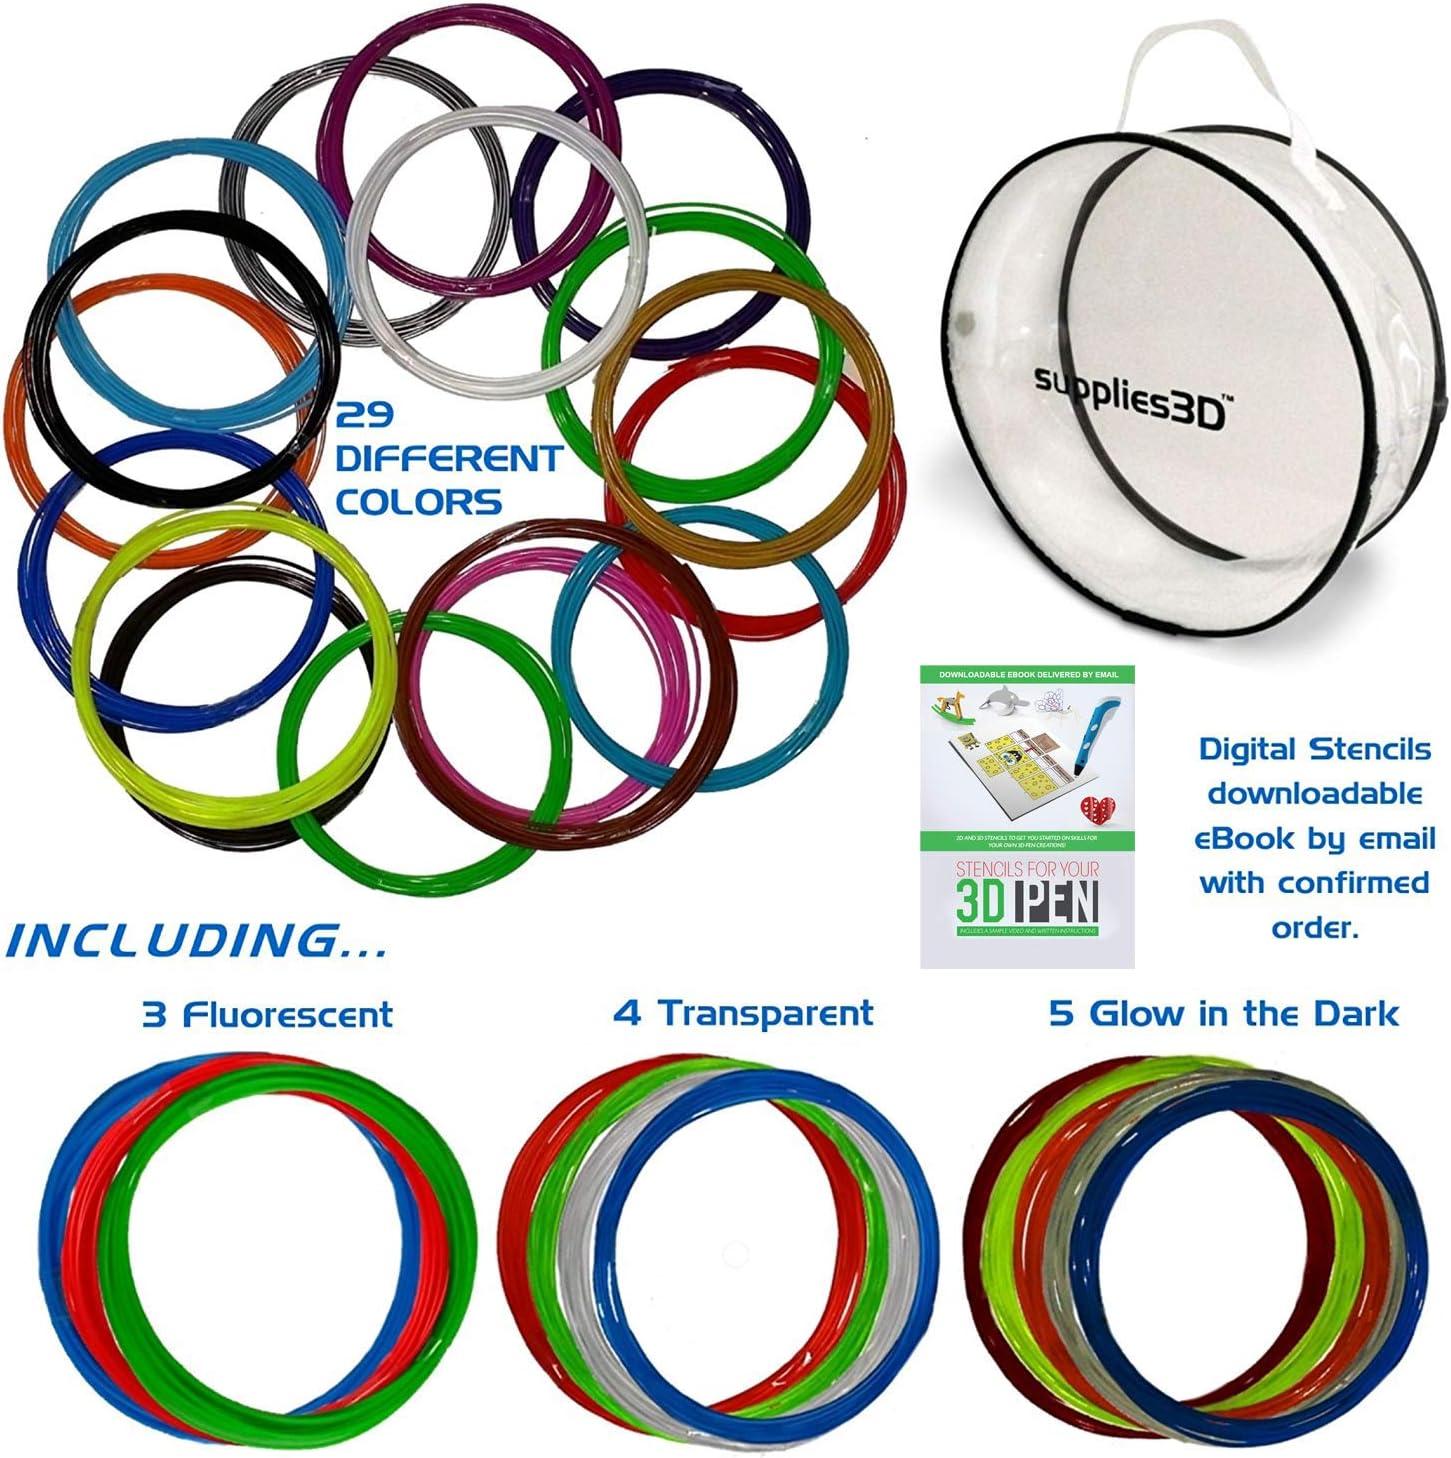 3D Pen Filament Refills - 1.75mm ABS Filament Bundle - 29 Colors Total 435ft Includes Transparent, Fluorescent, Glow in The Dark